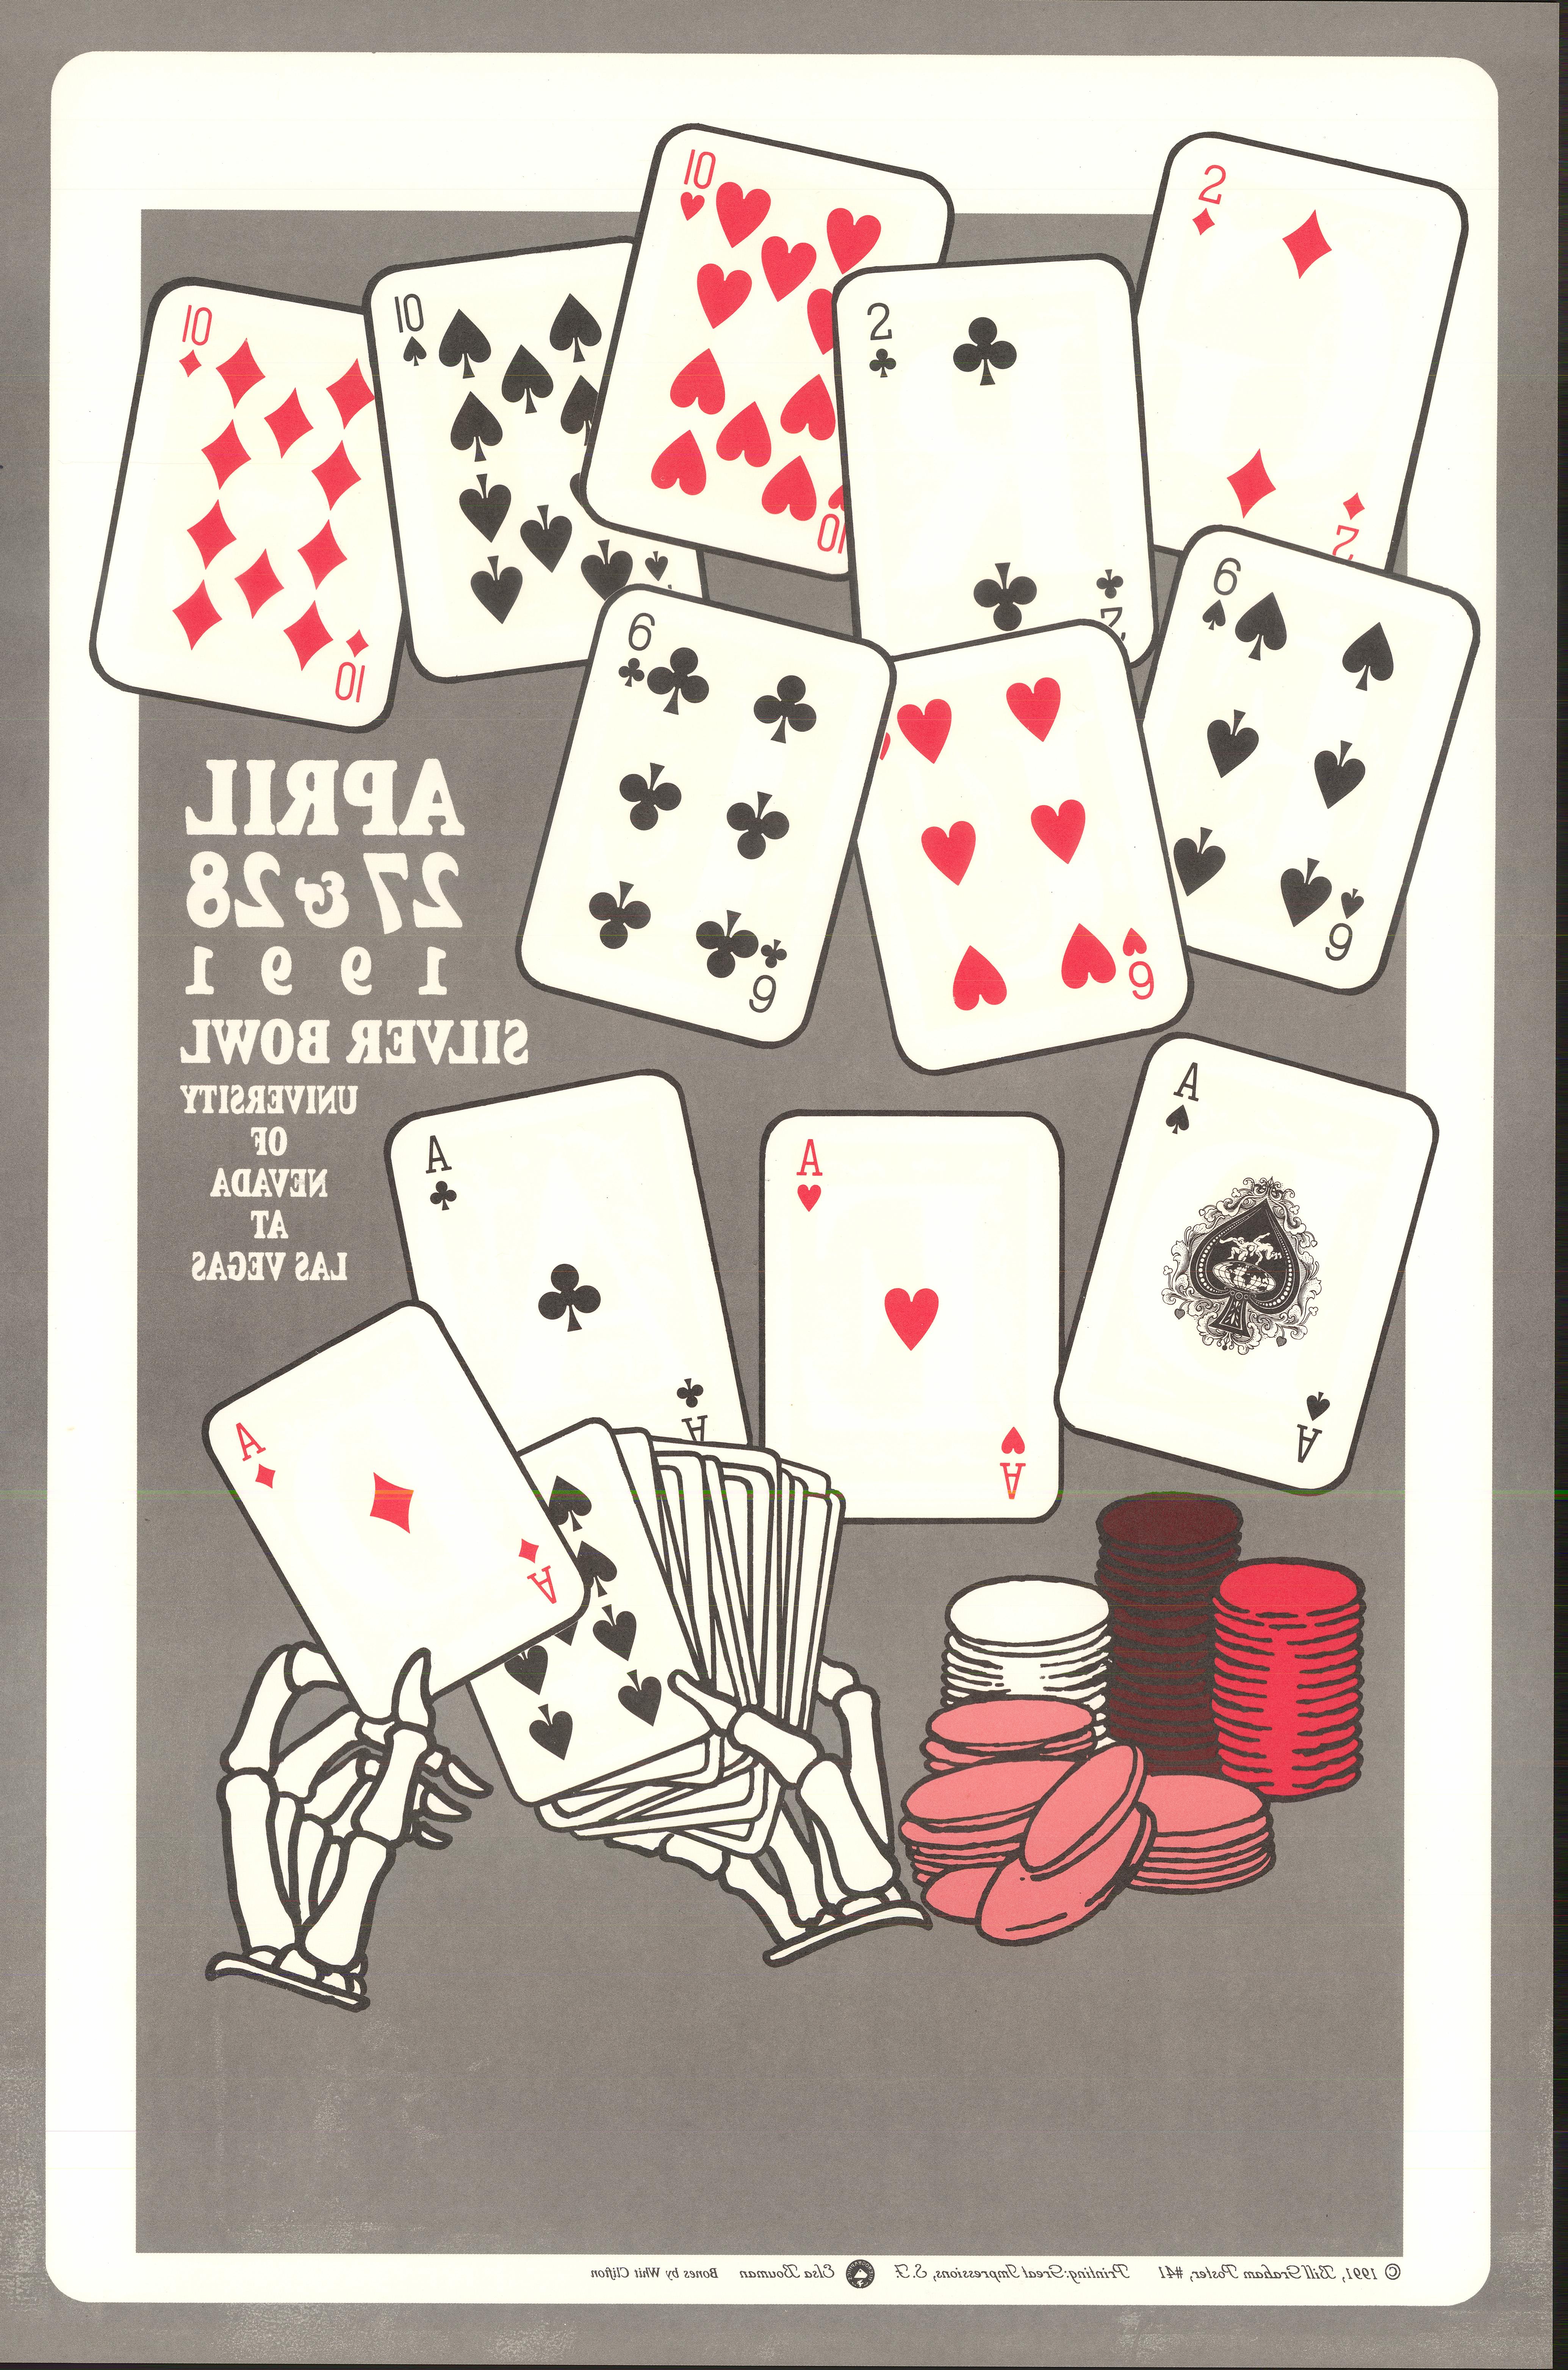 Grateful Dead Poster reverse side